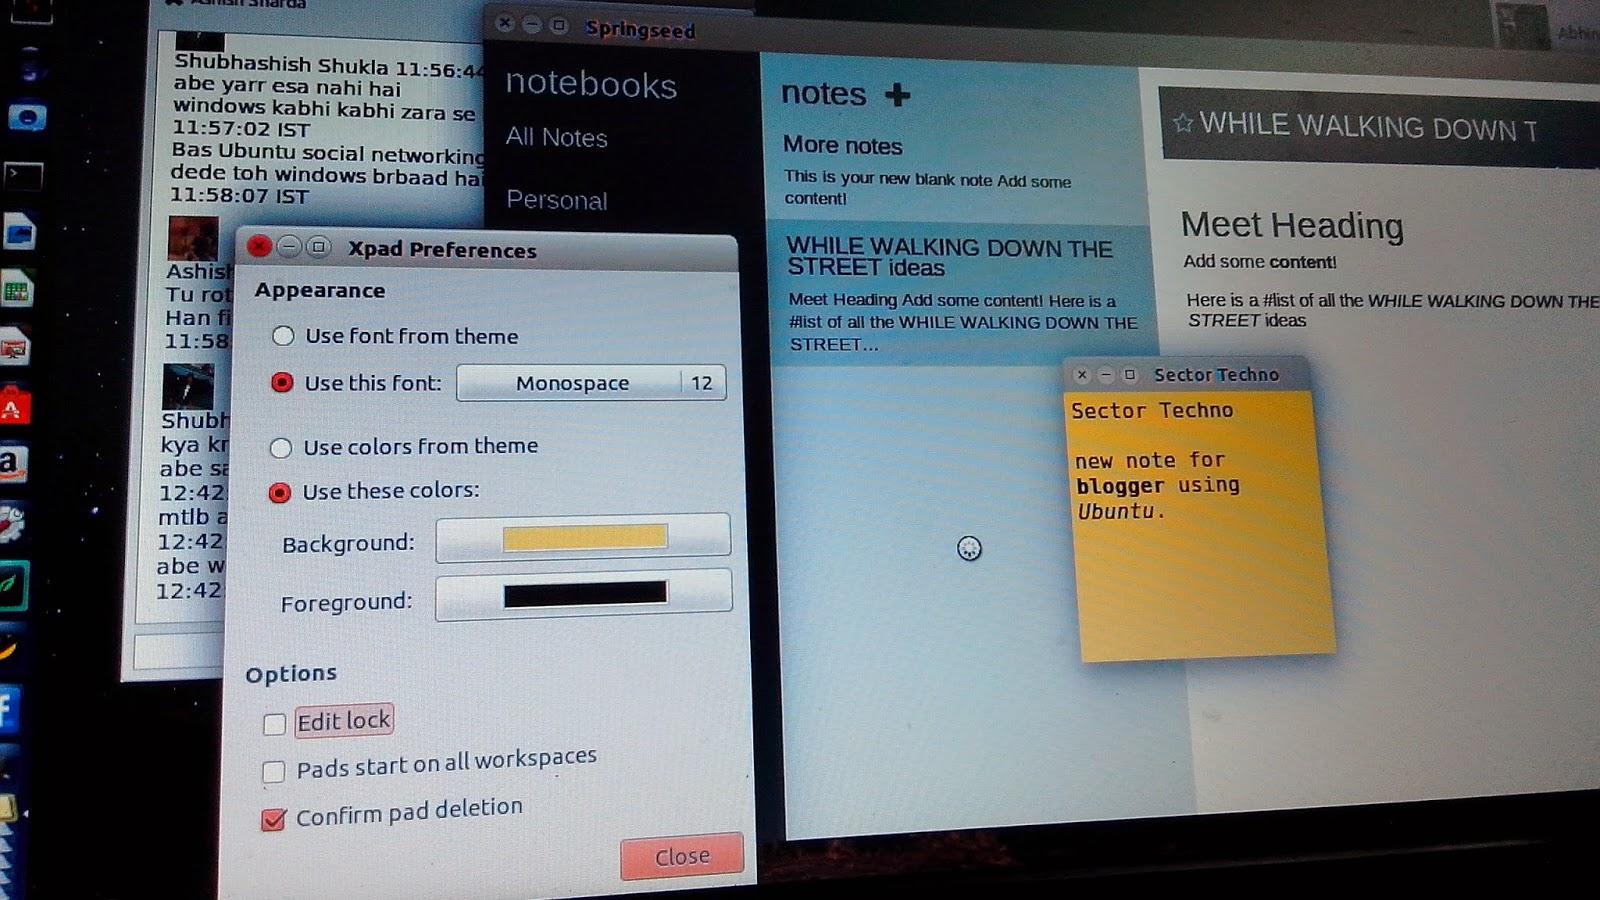 ubuntu for bloggers